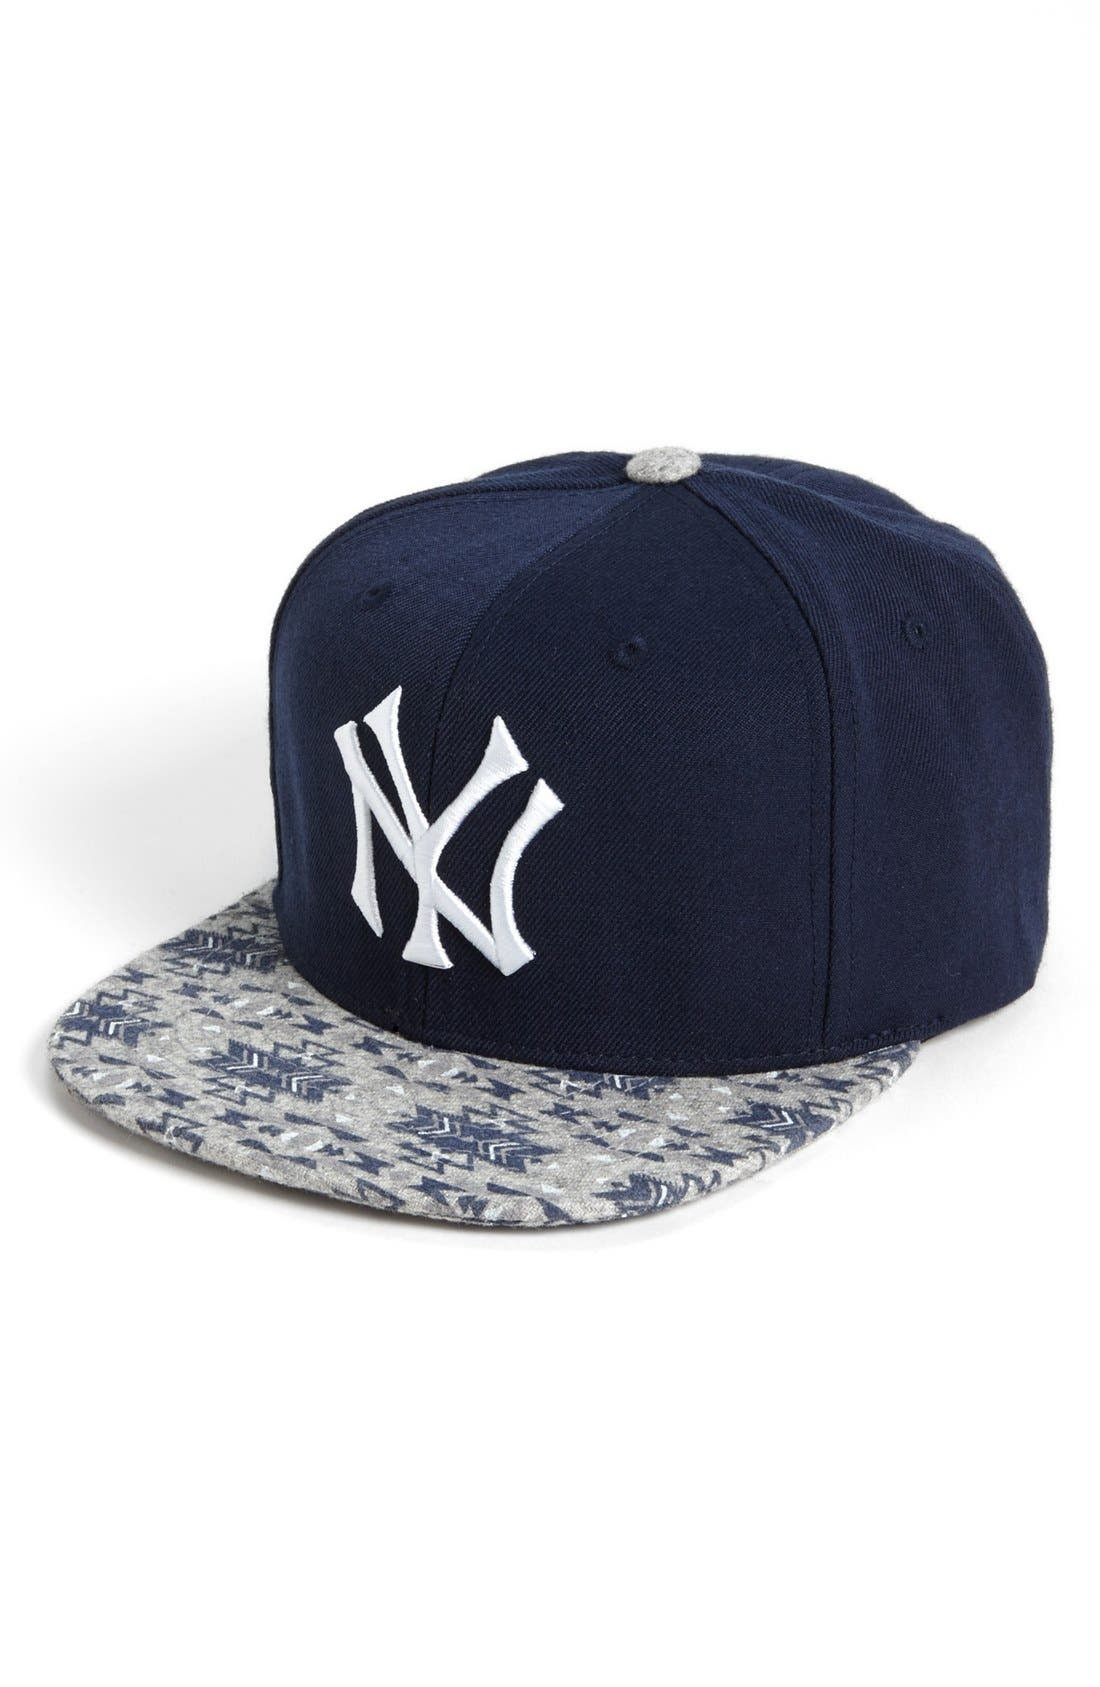 Alternate Image 1 Selected - American Needle 'New York Yankees Print Bill' Baseball Cap